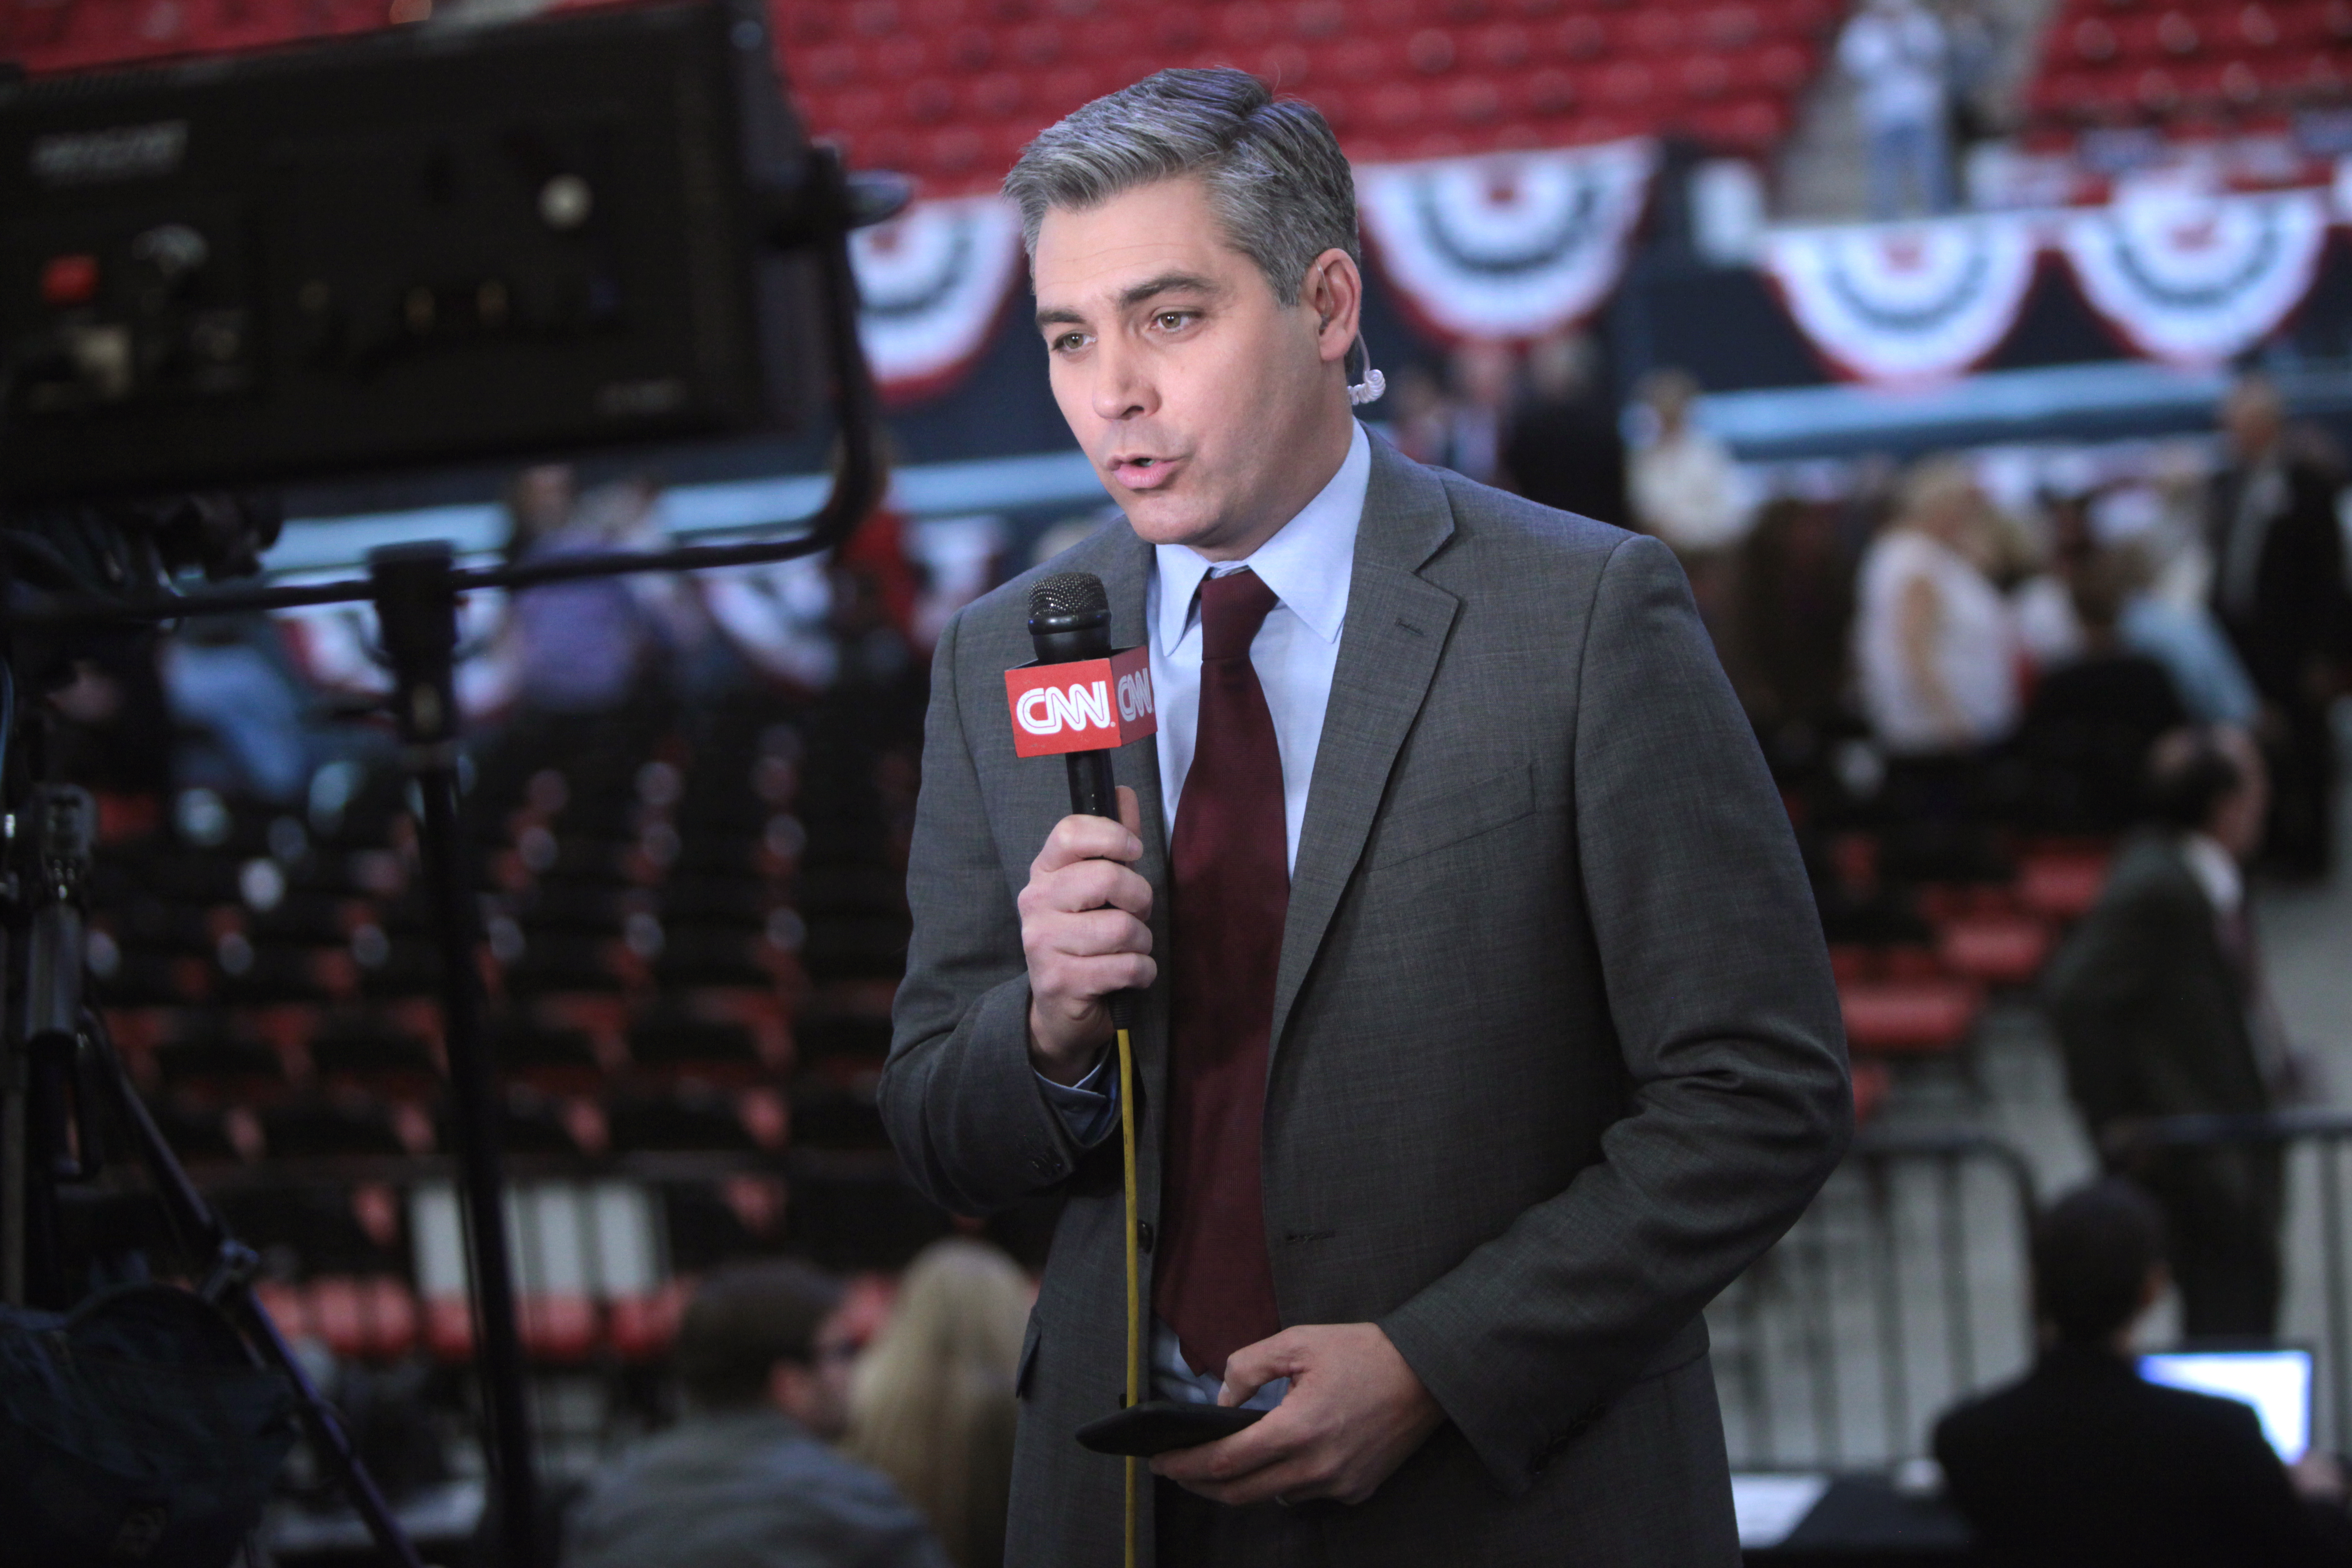 MSNBC Panel Savages CNN's 'Obnoxious Idiot' Jim Acosta ...